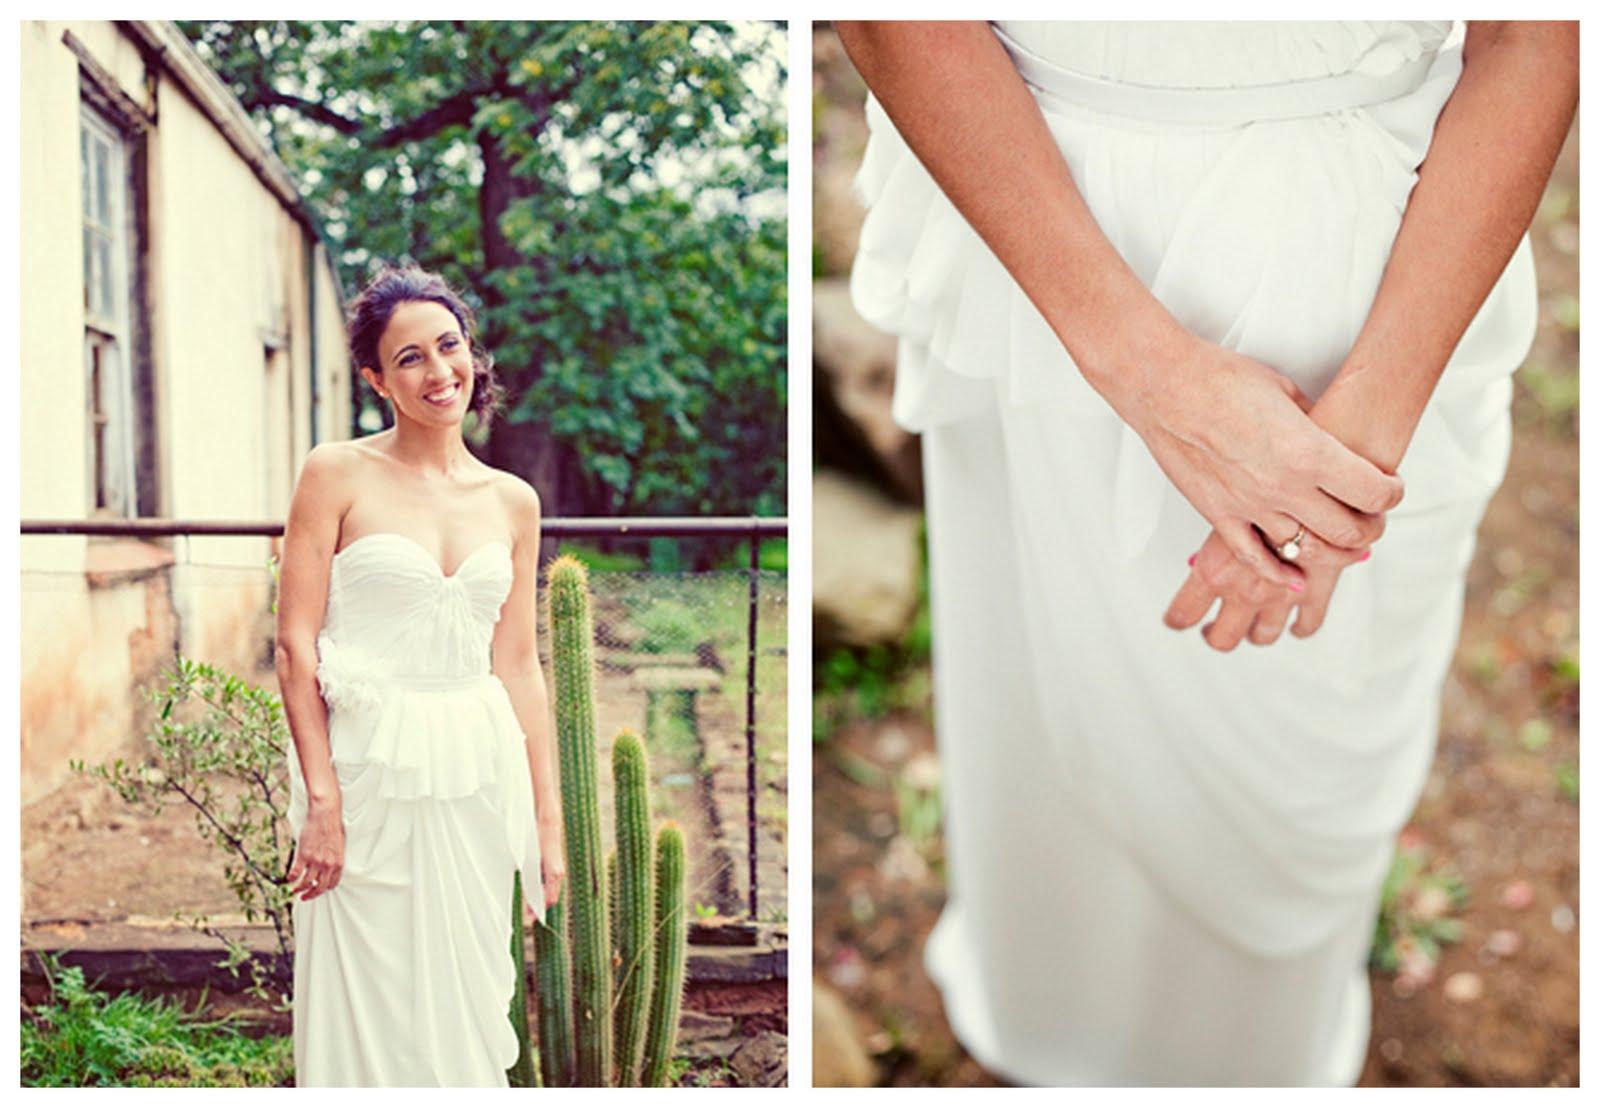 Wedding Dress Pictures Ideas 90 Fresh Other stealworthy wedding ideas